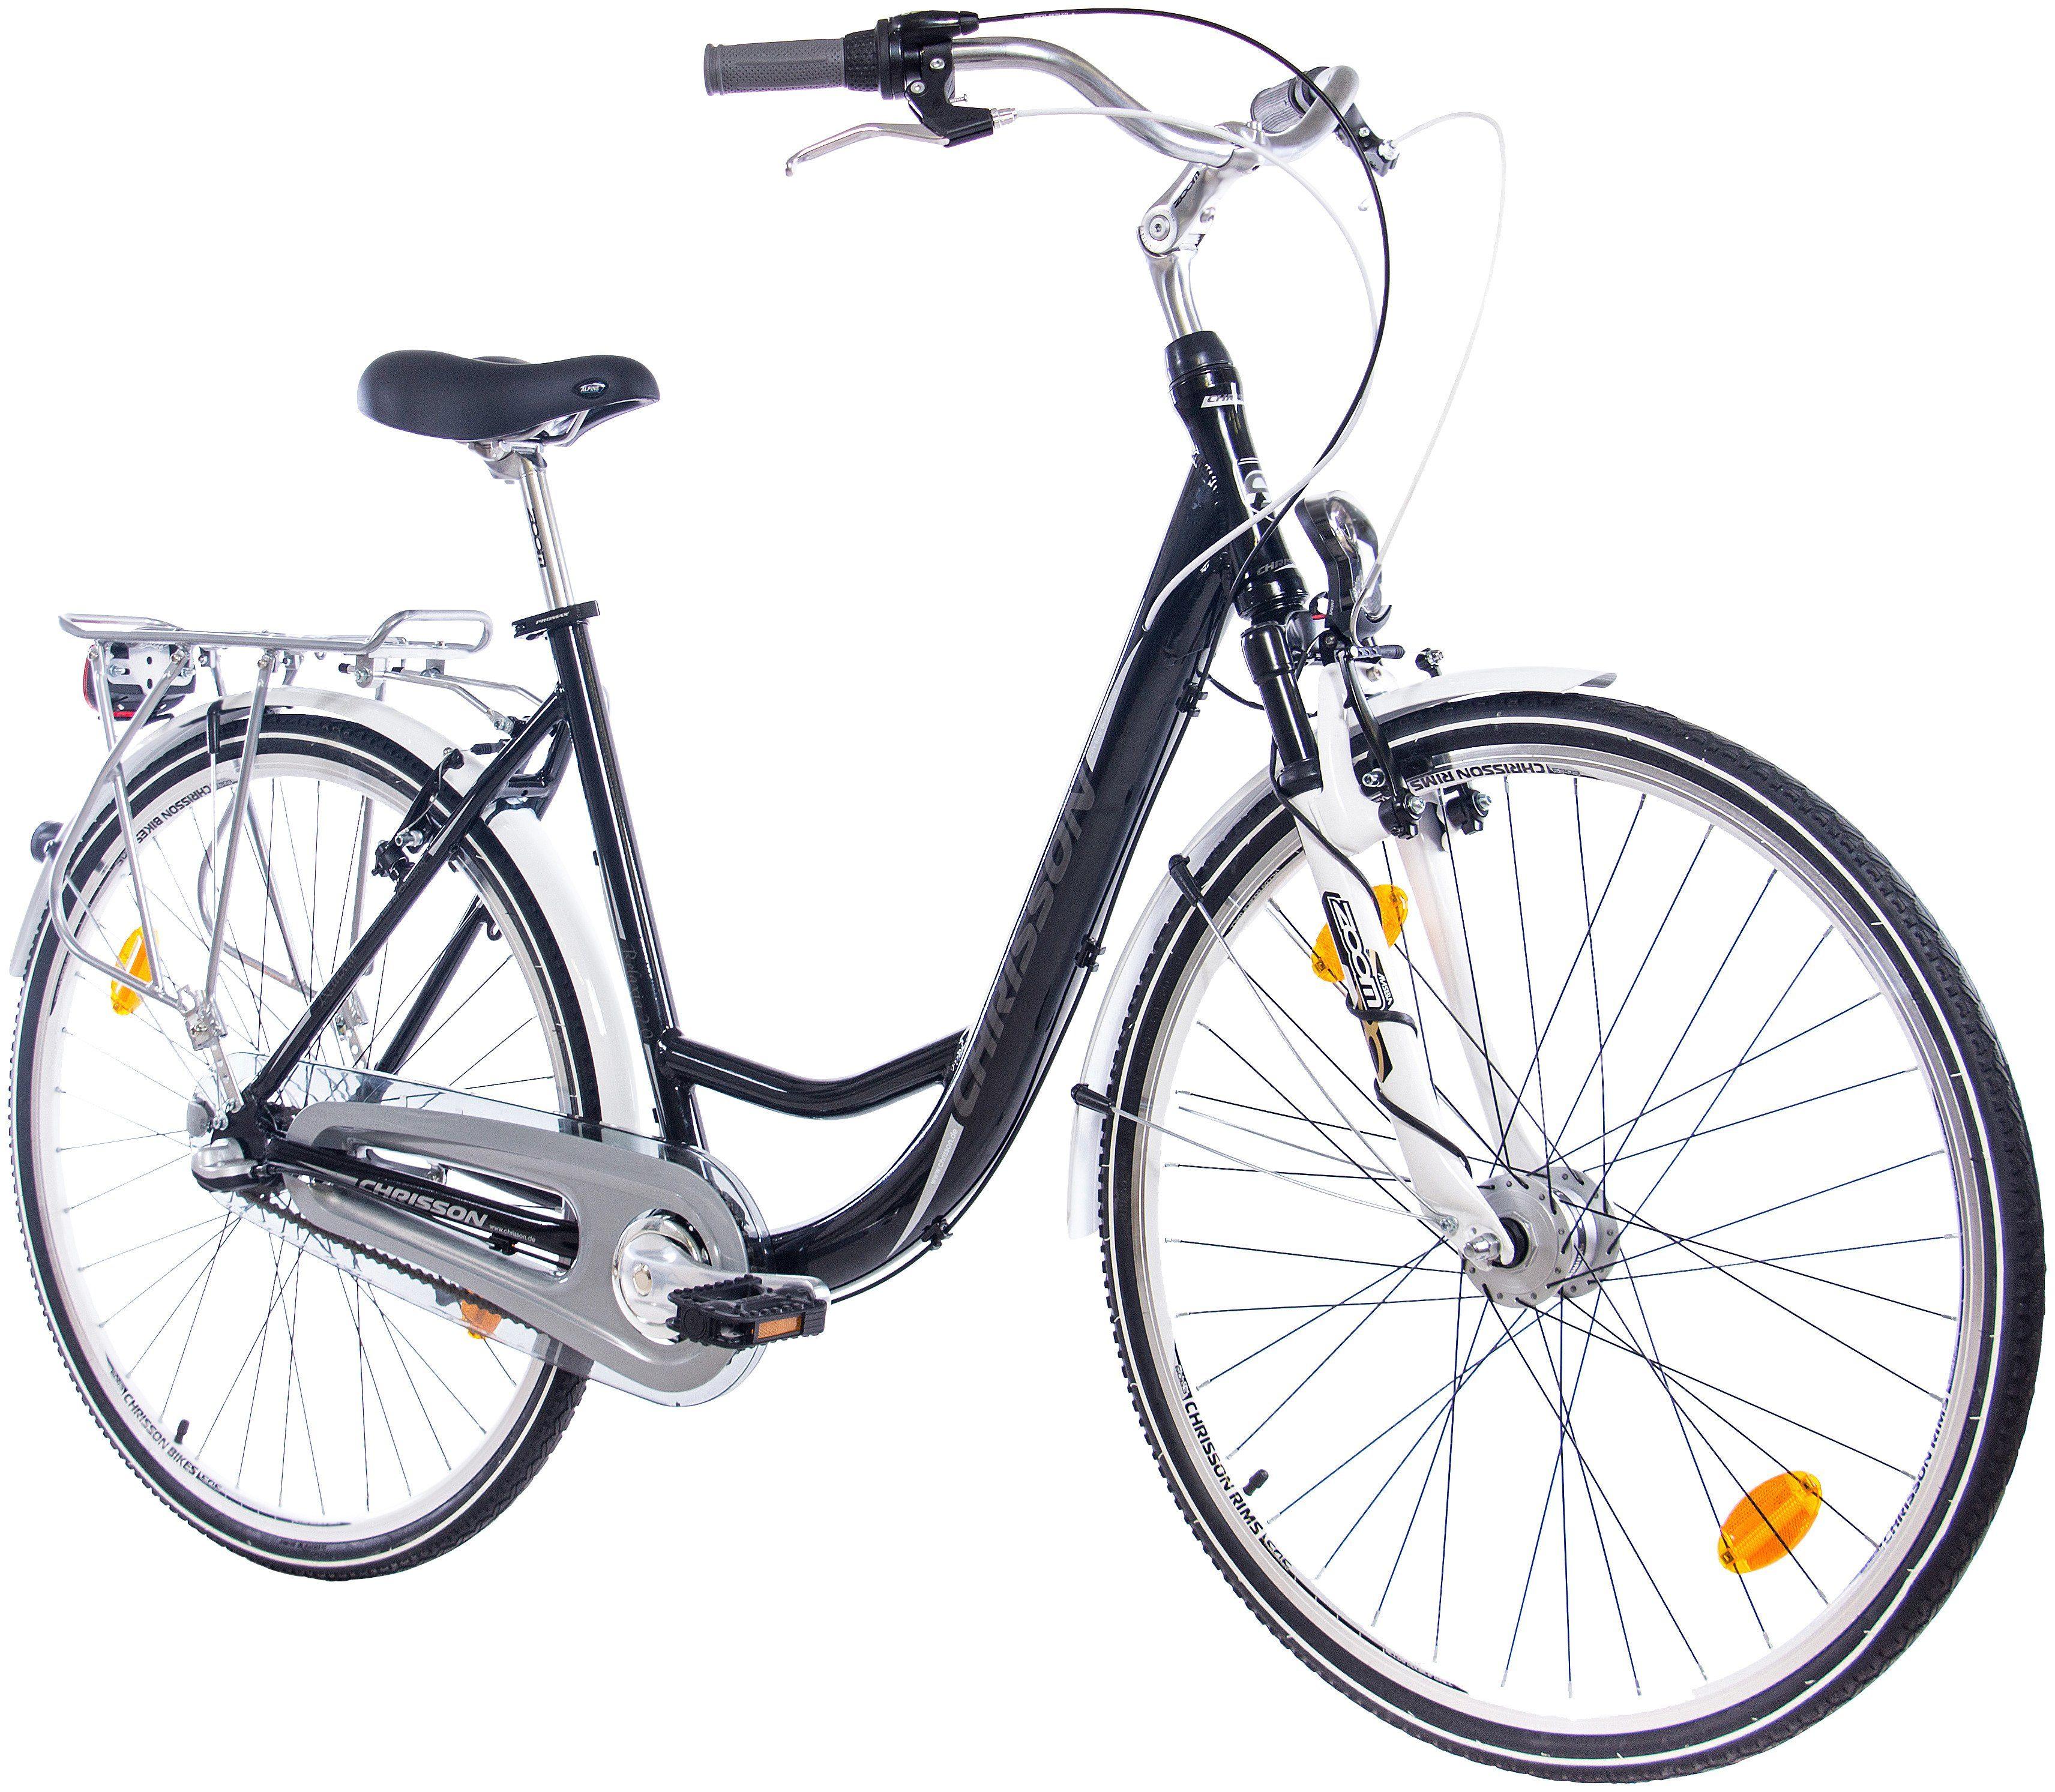 Citybike (Damen) »RELAXIA 2.0 schwarz, 71,12 cm (28 Zoll)«